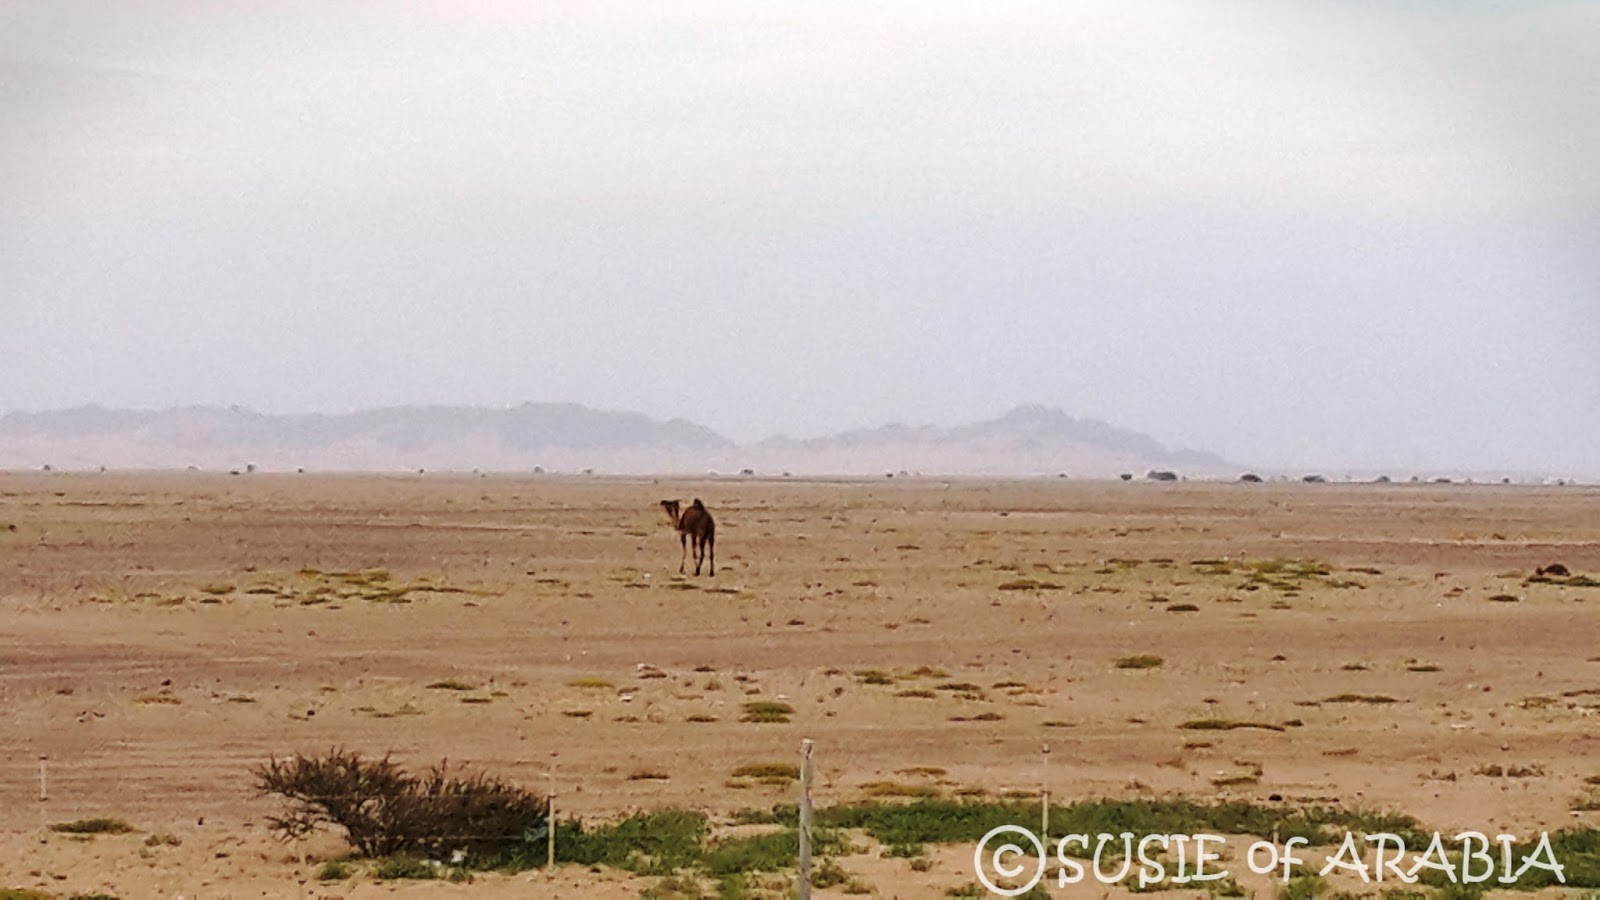 Jeddah Daily Photo: Saudi Arabia Desert Camel and Goats